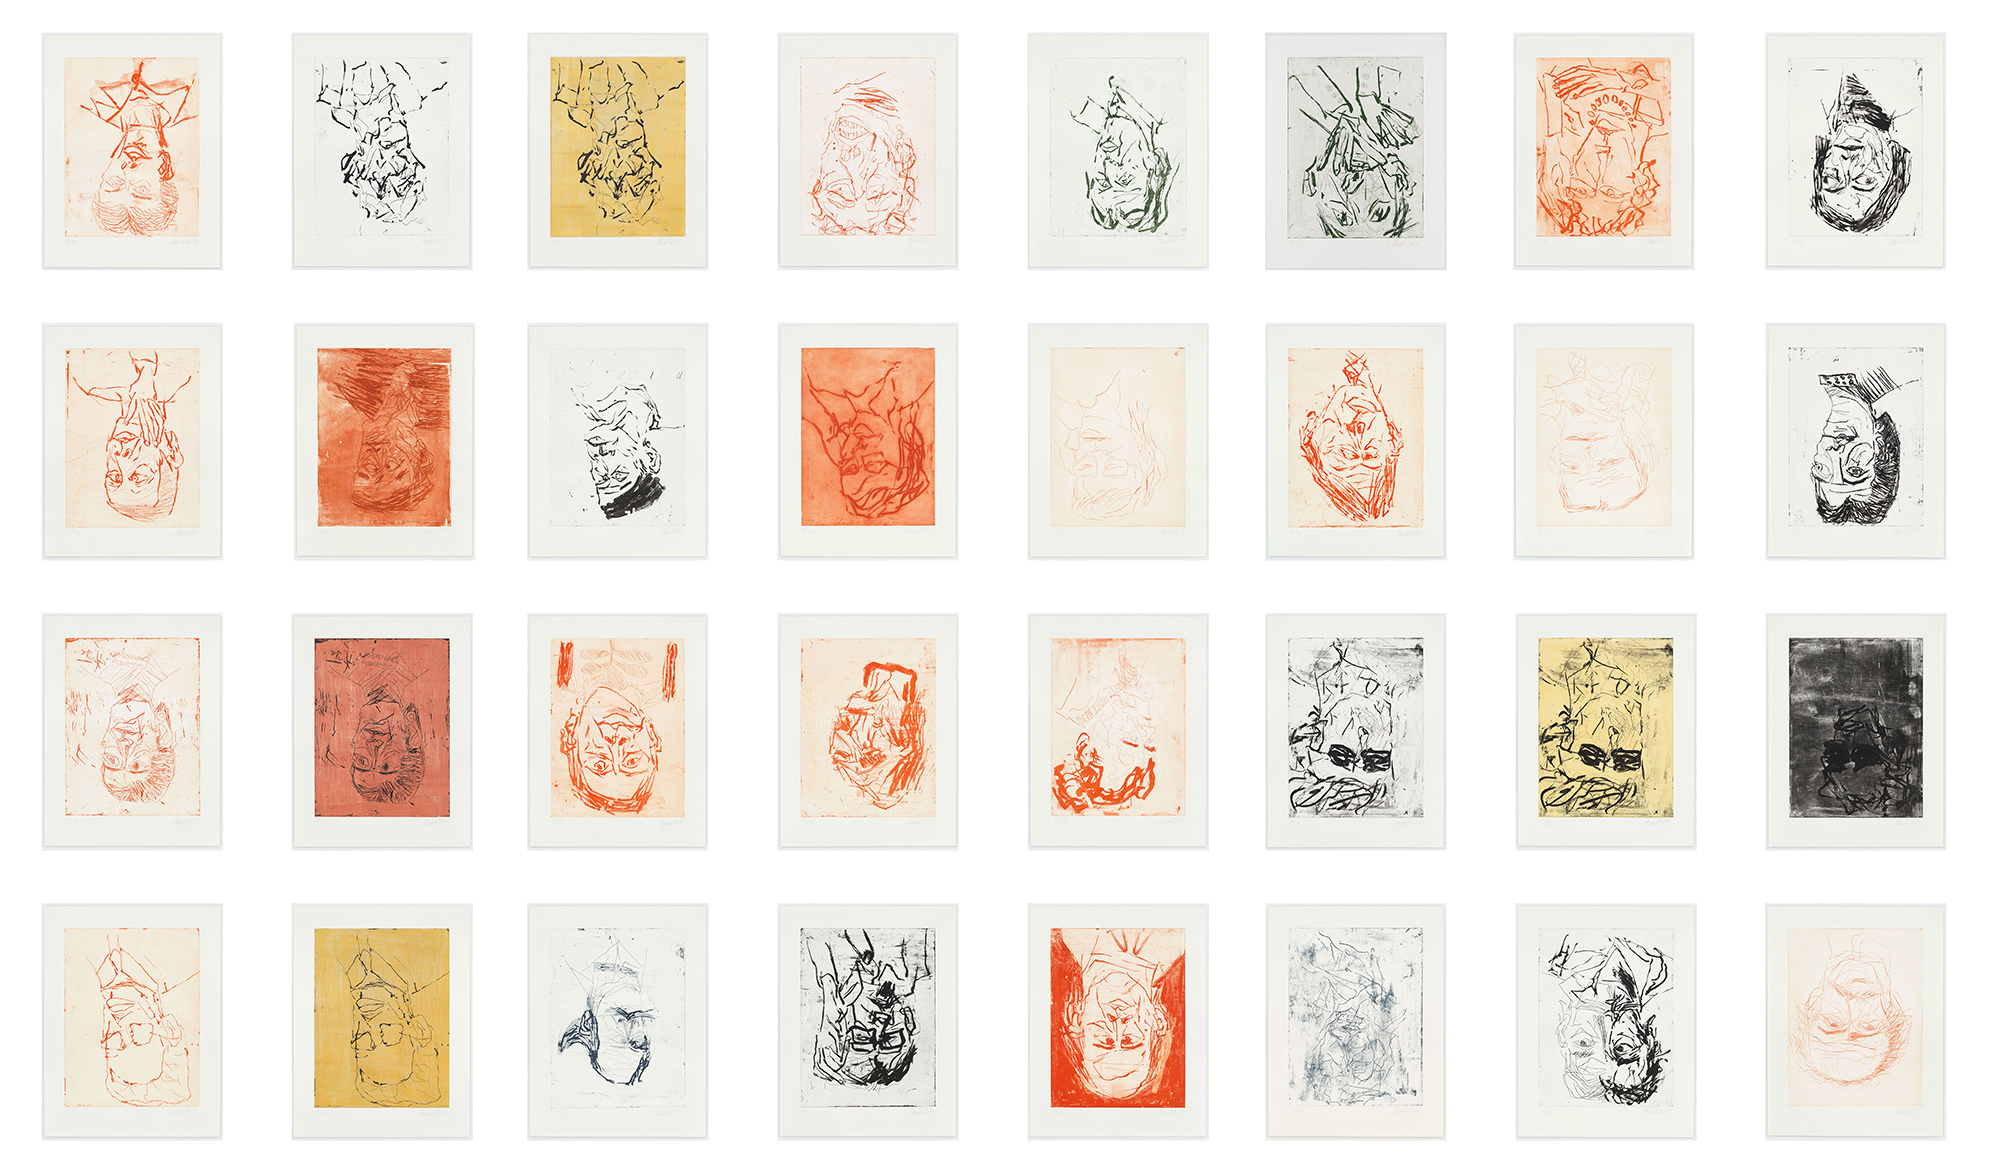 Photo Grid of Baselitz Devotion Print Series